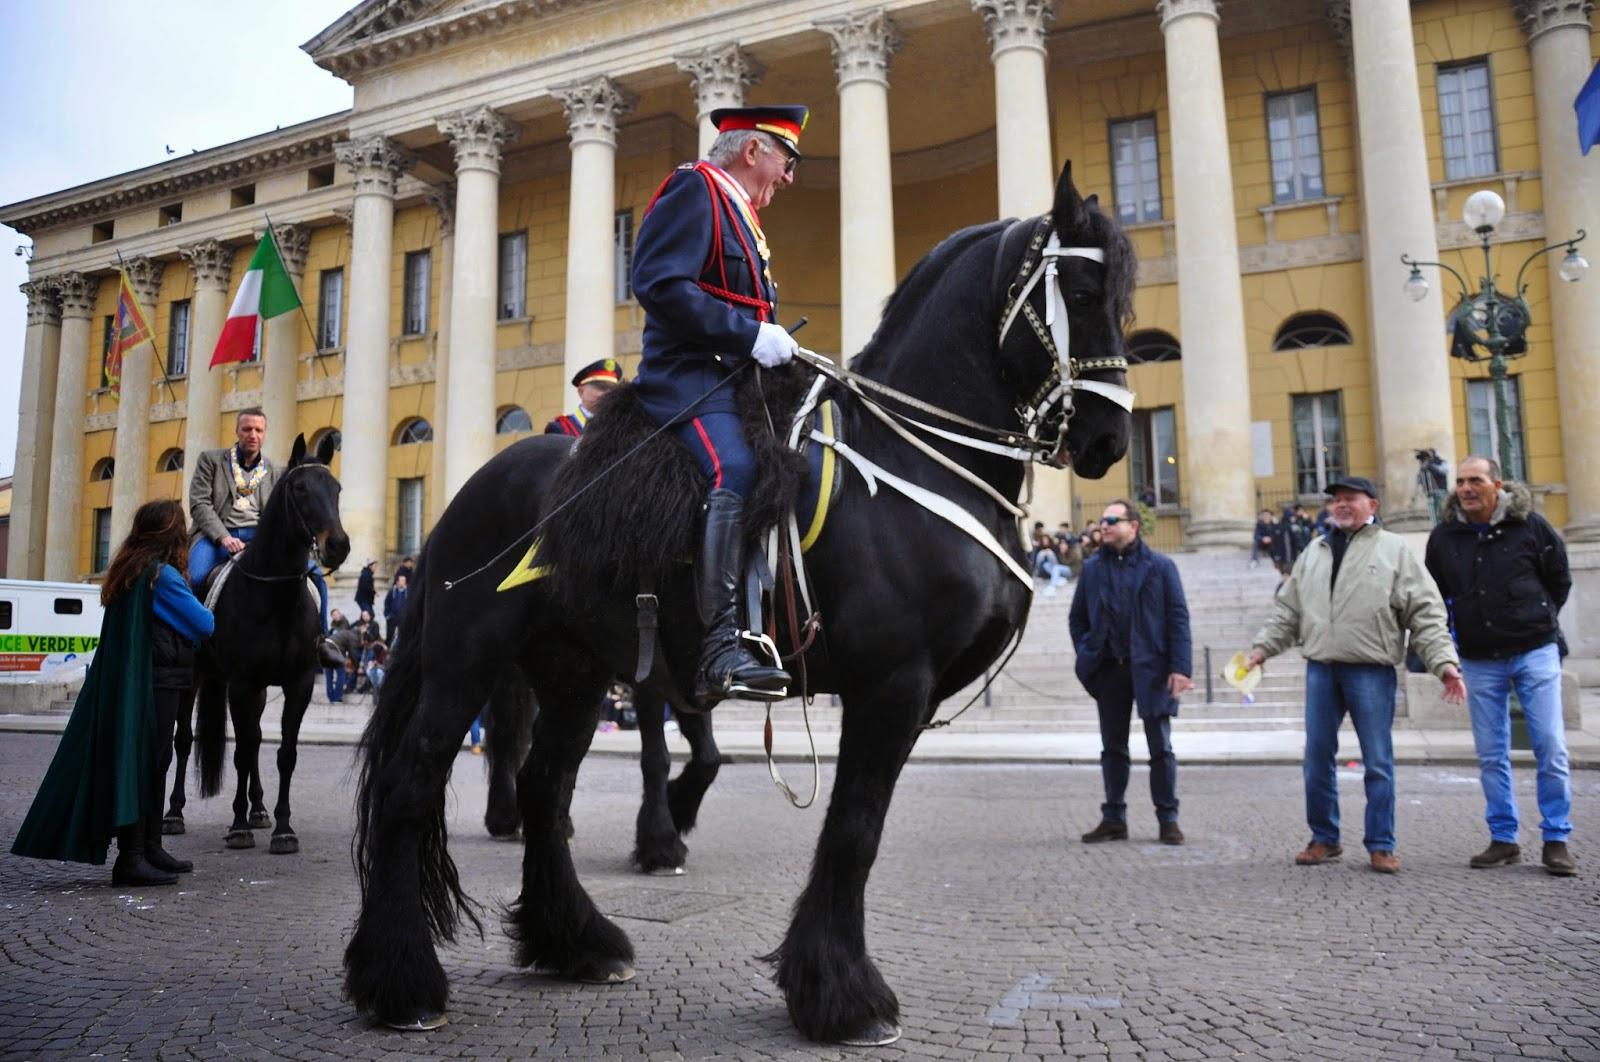 Fabulous horses in front of Palazzo Barbieri in Verona